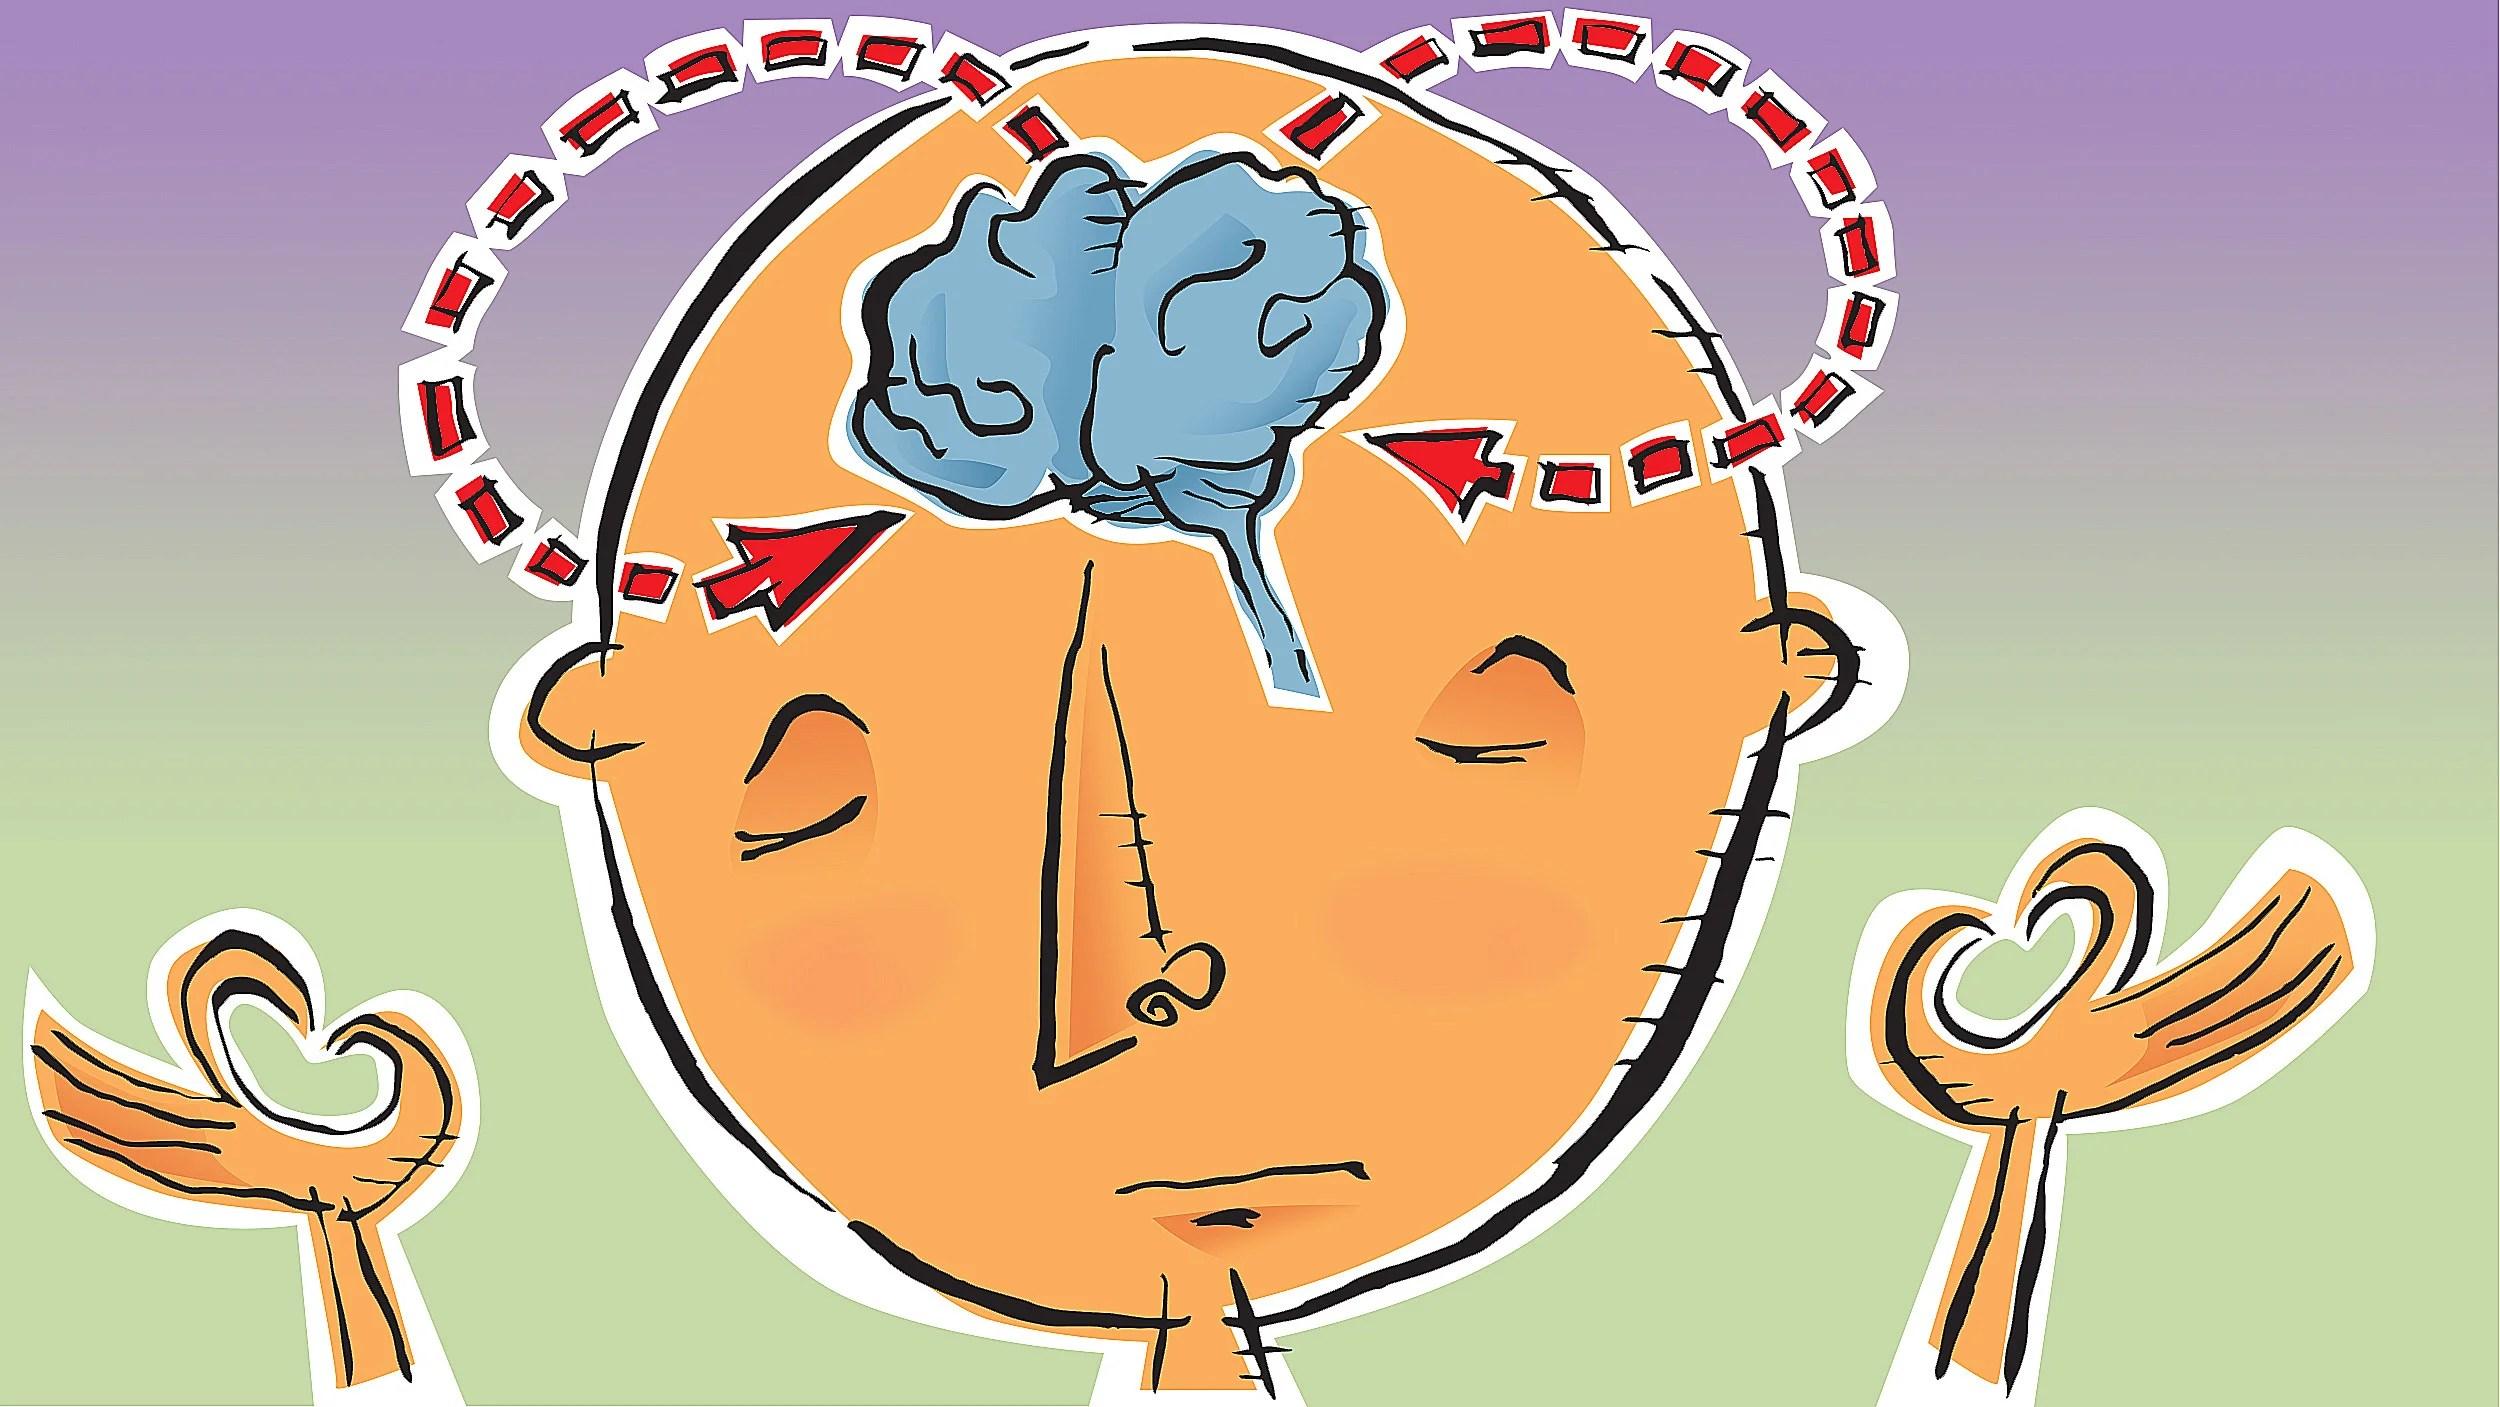 How meditation works scientifically